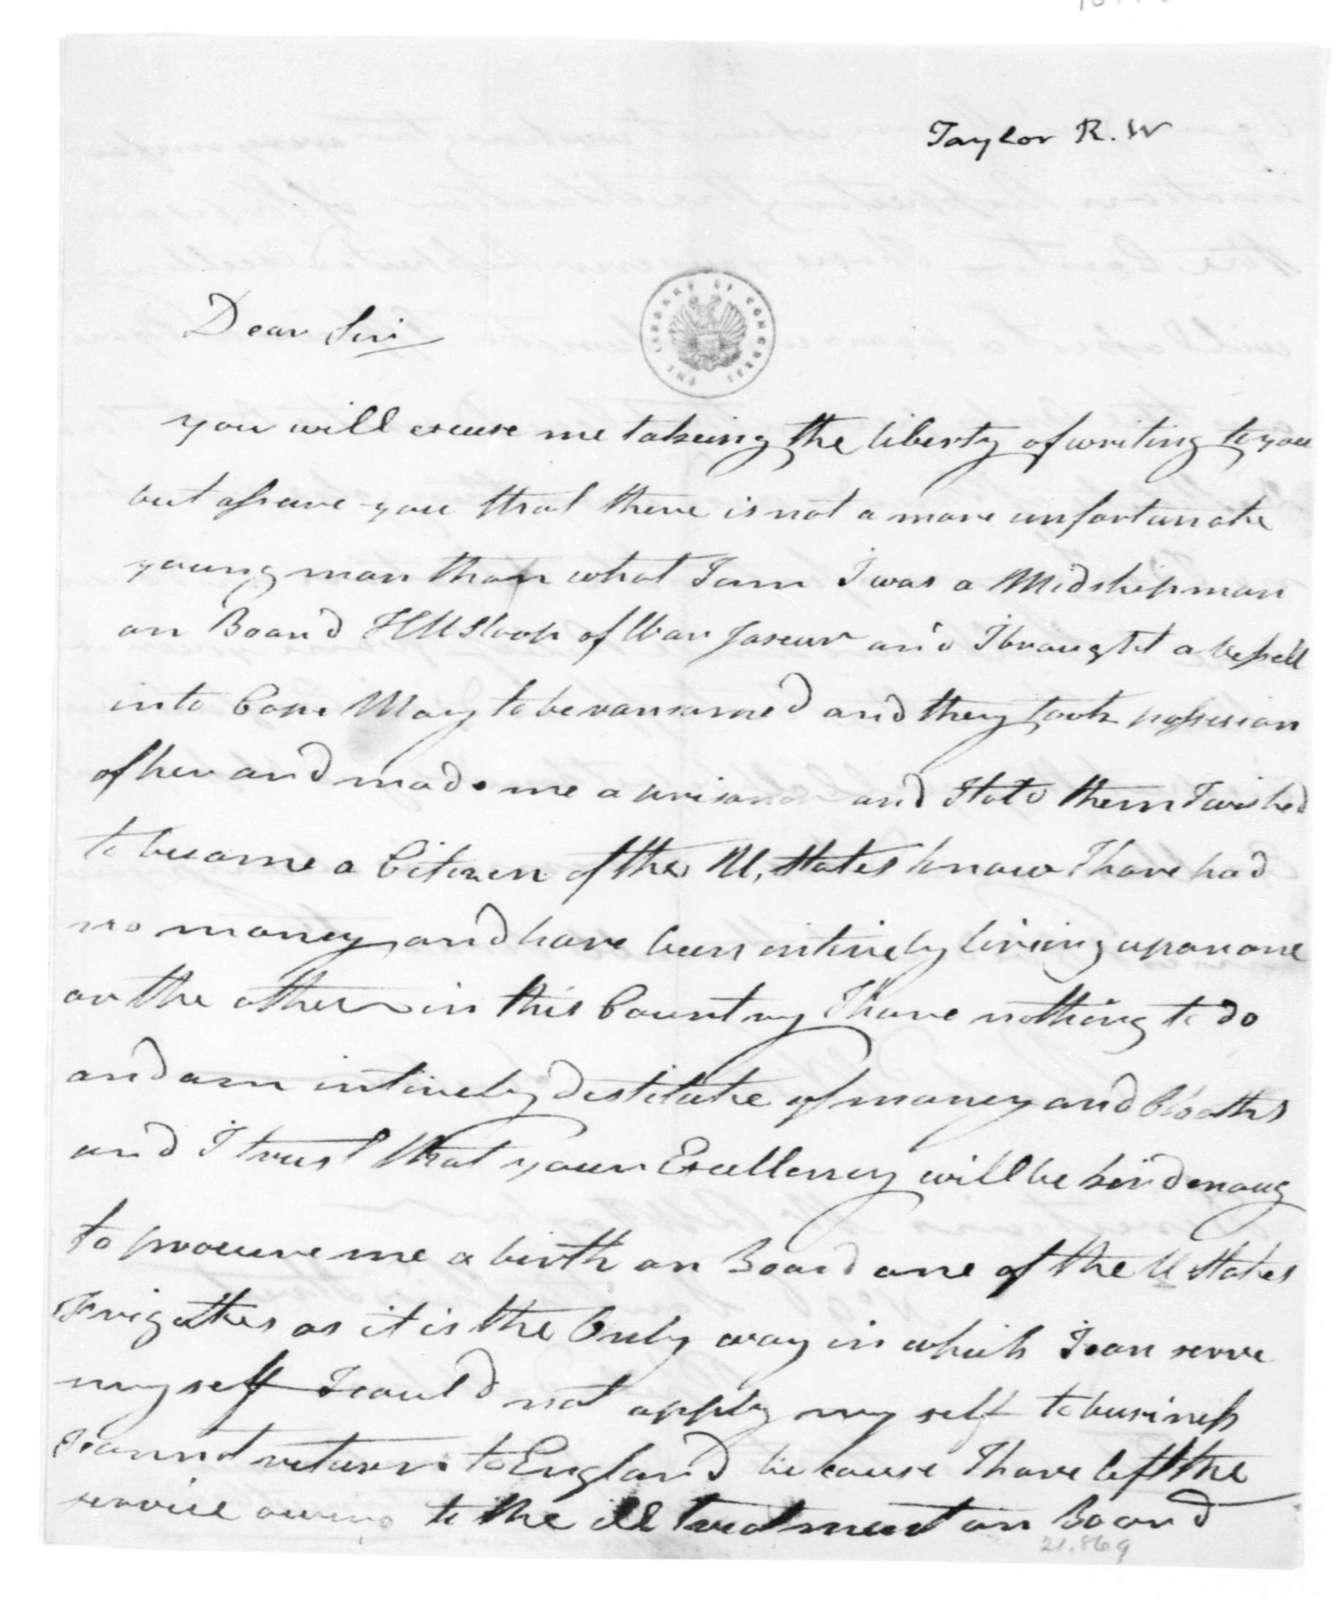 Richard W. Taylor to James Madison. 1814.